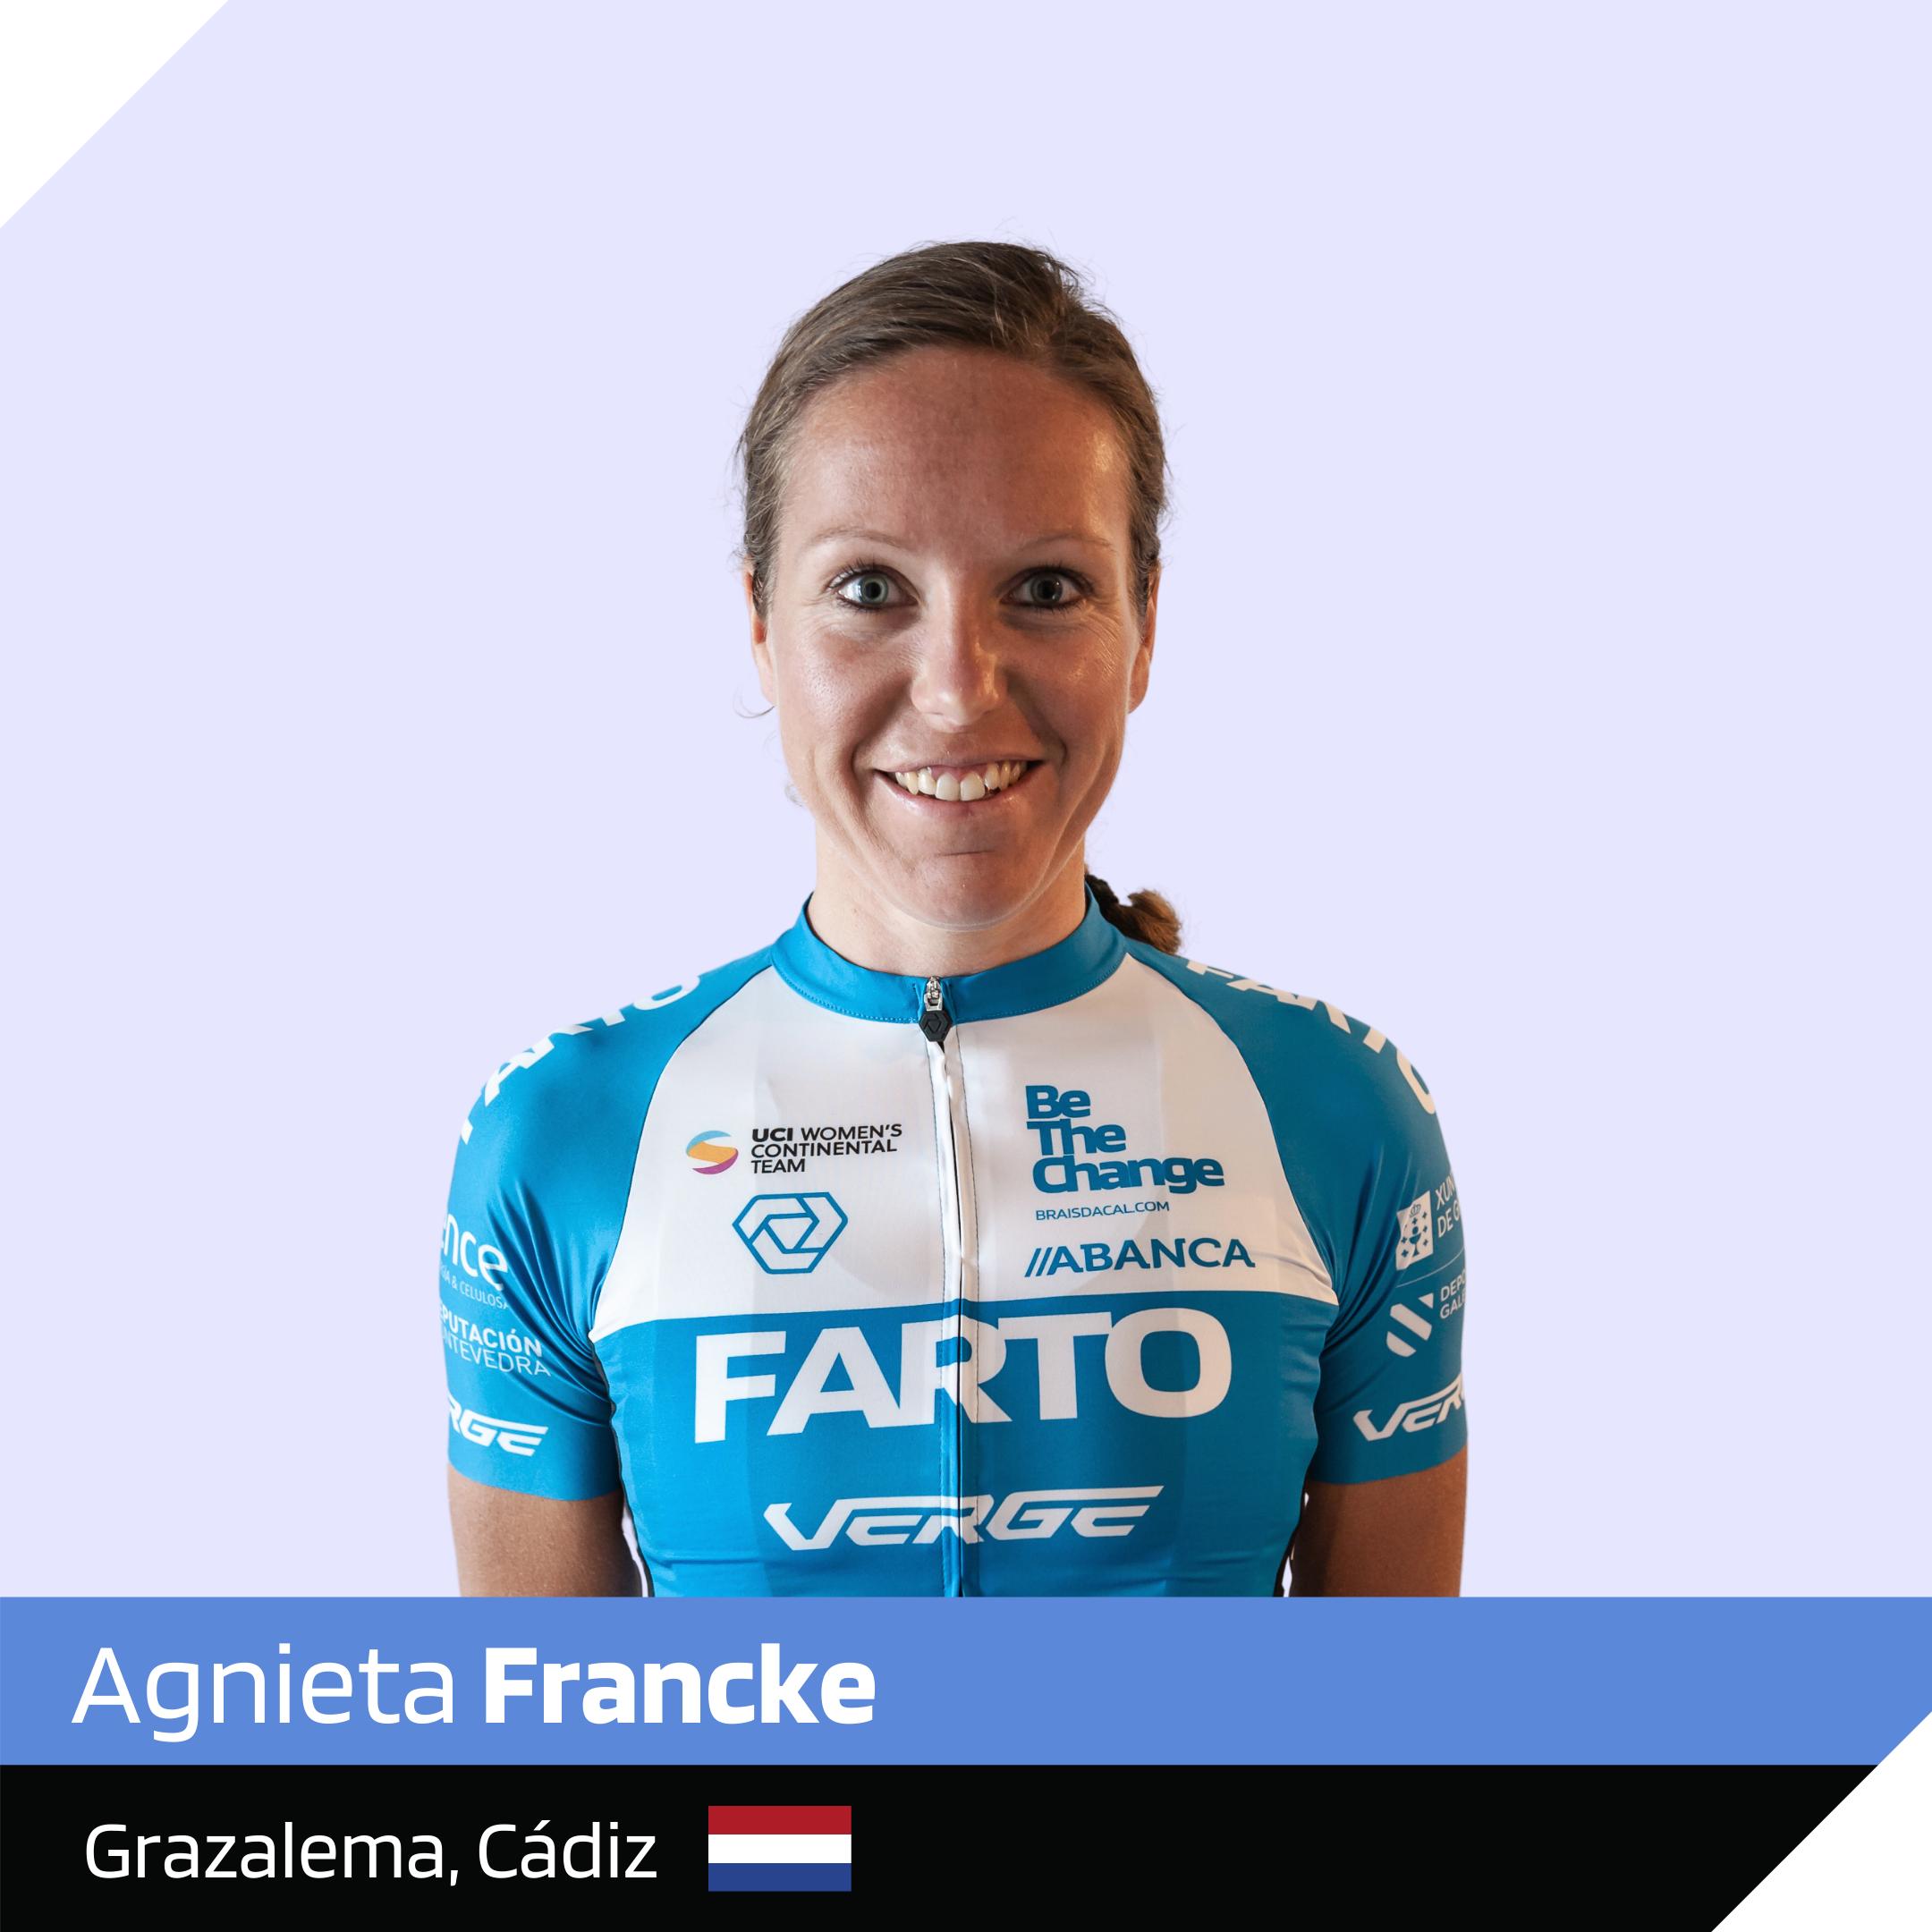 Agnieta Francke